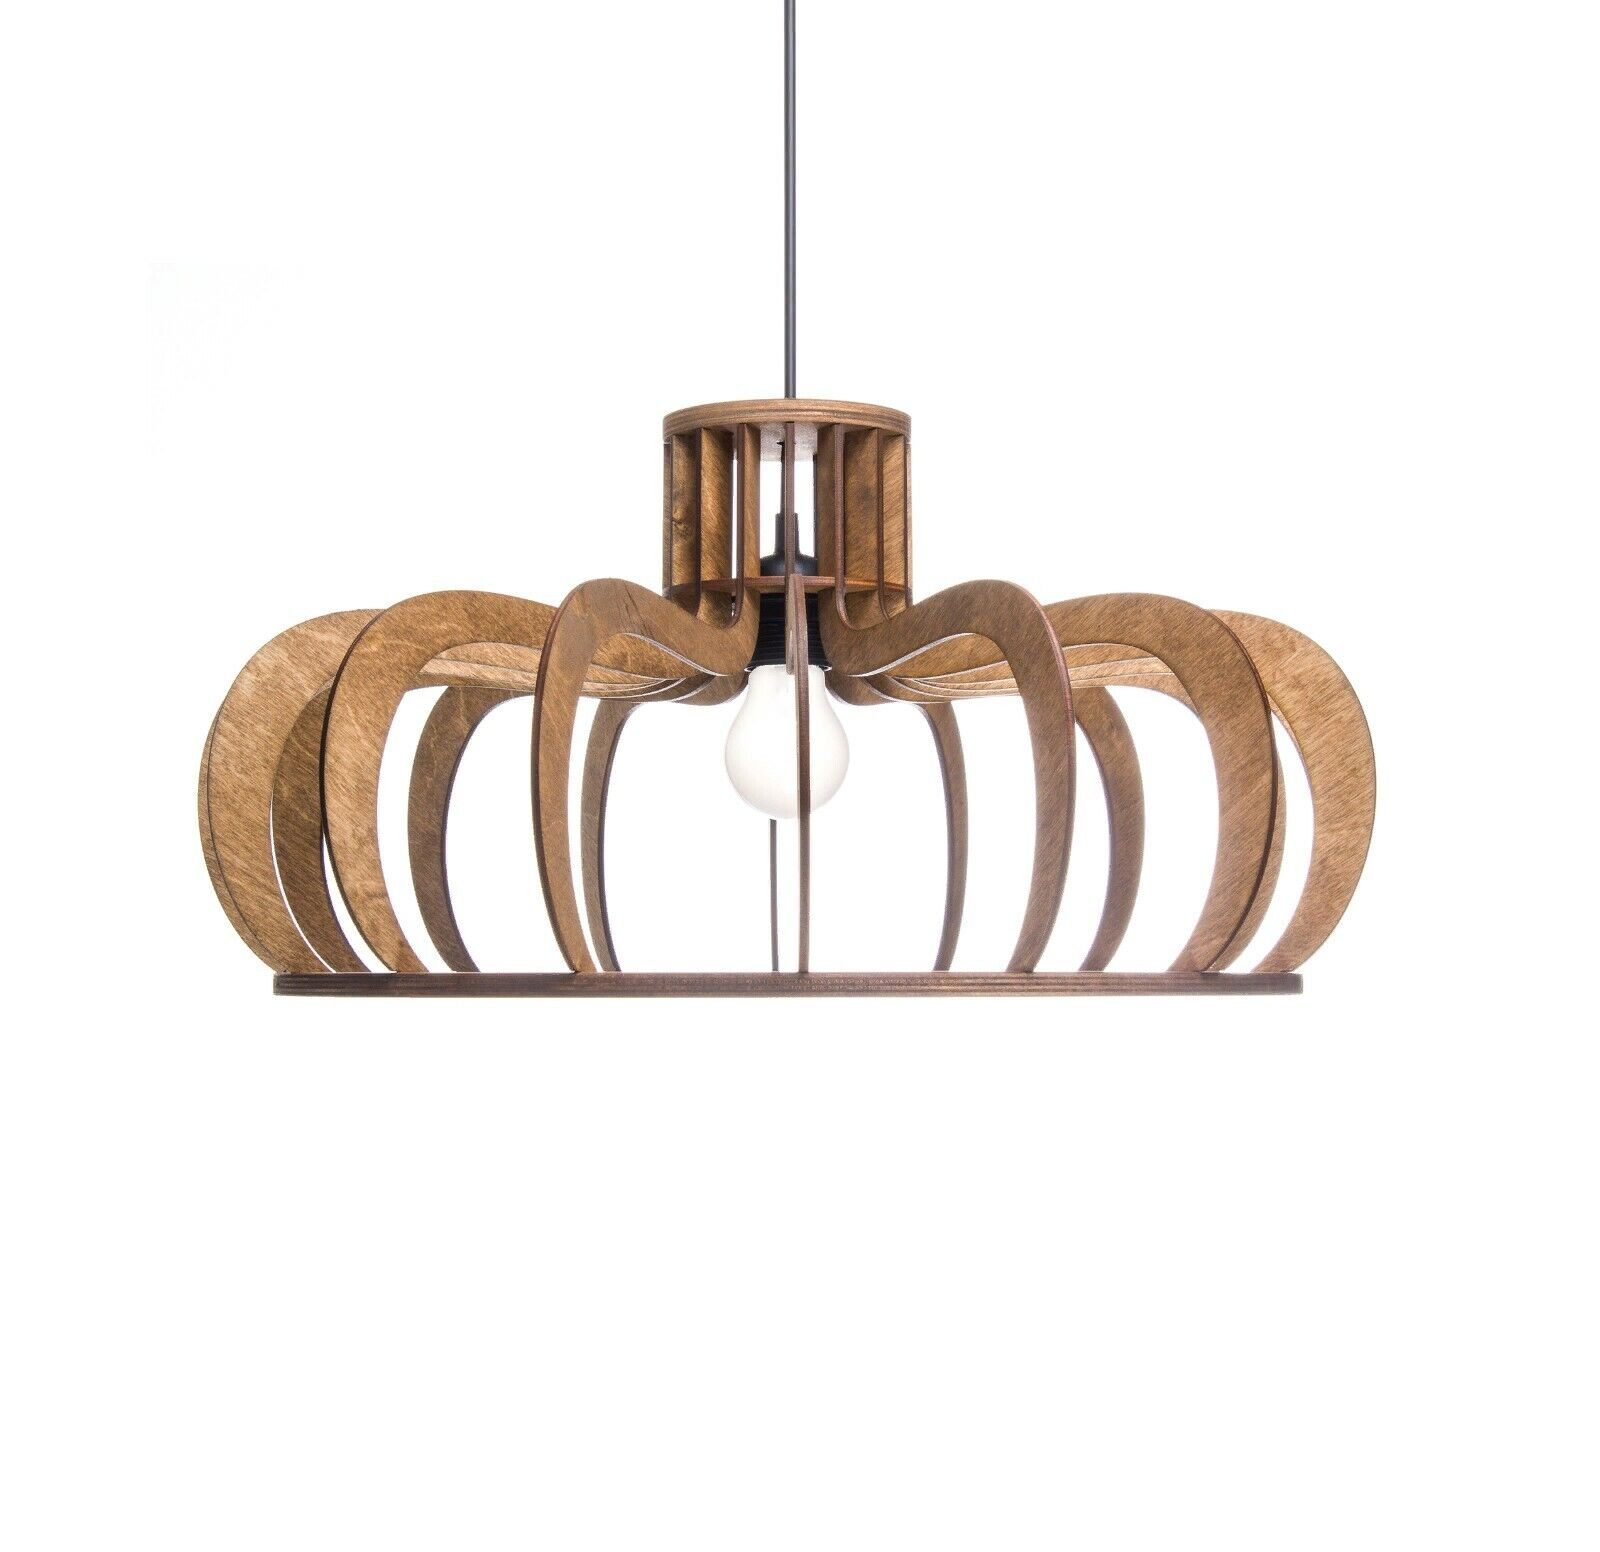 Unique pendant lamp Wood ceiling light Kitchen lighting Dining room chandelier